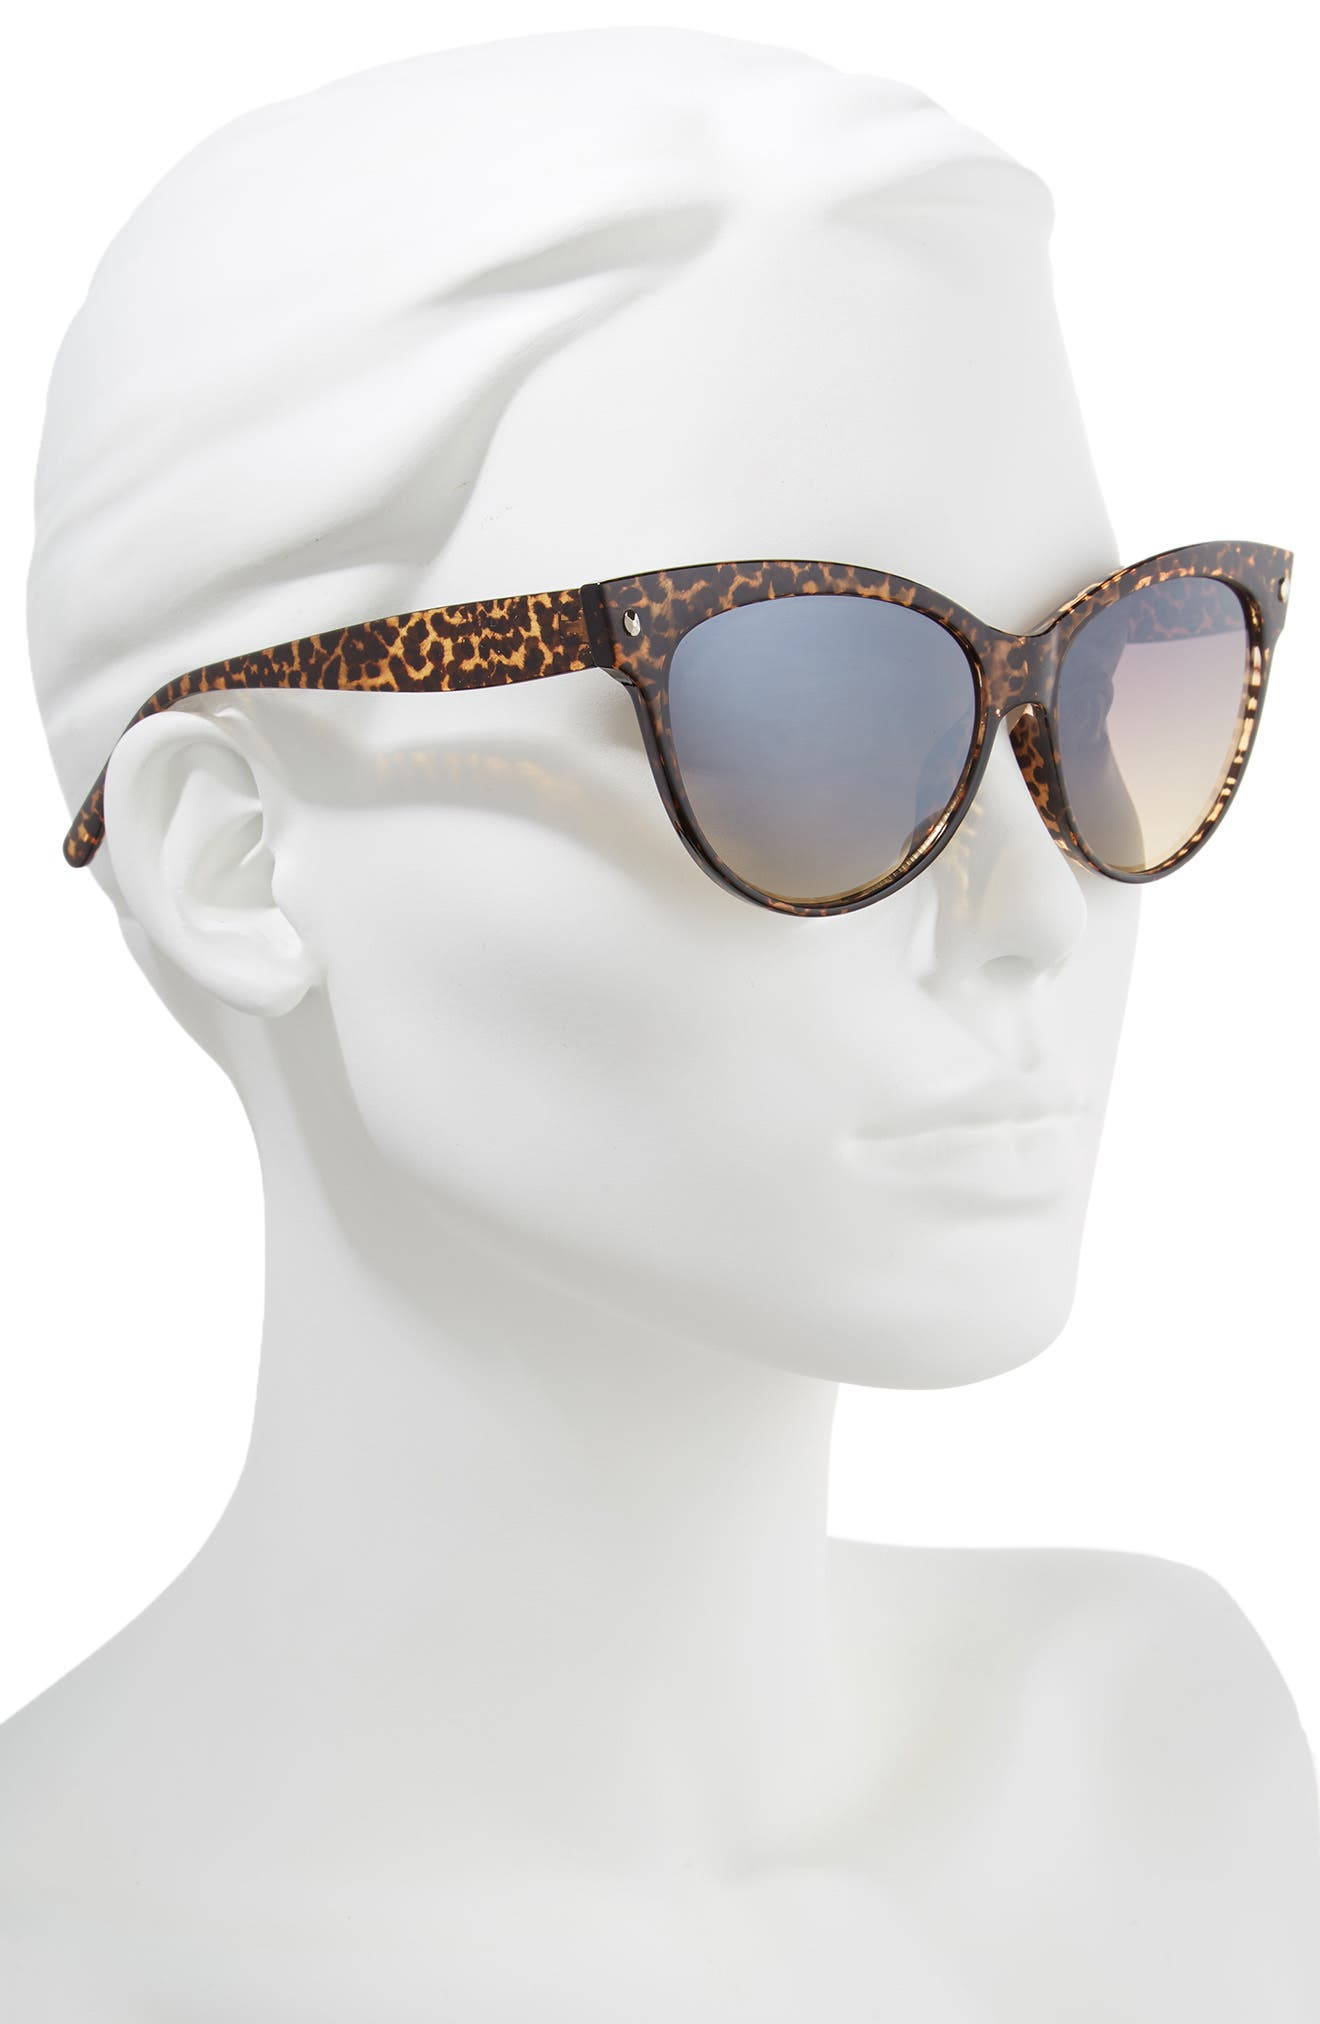 56mm Print Cat Eye Sunglasses,                             Alternate thumbnail 2, color,                             Leopard/ Brown